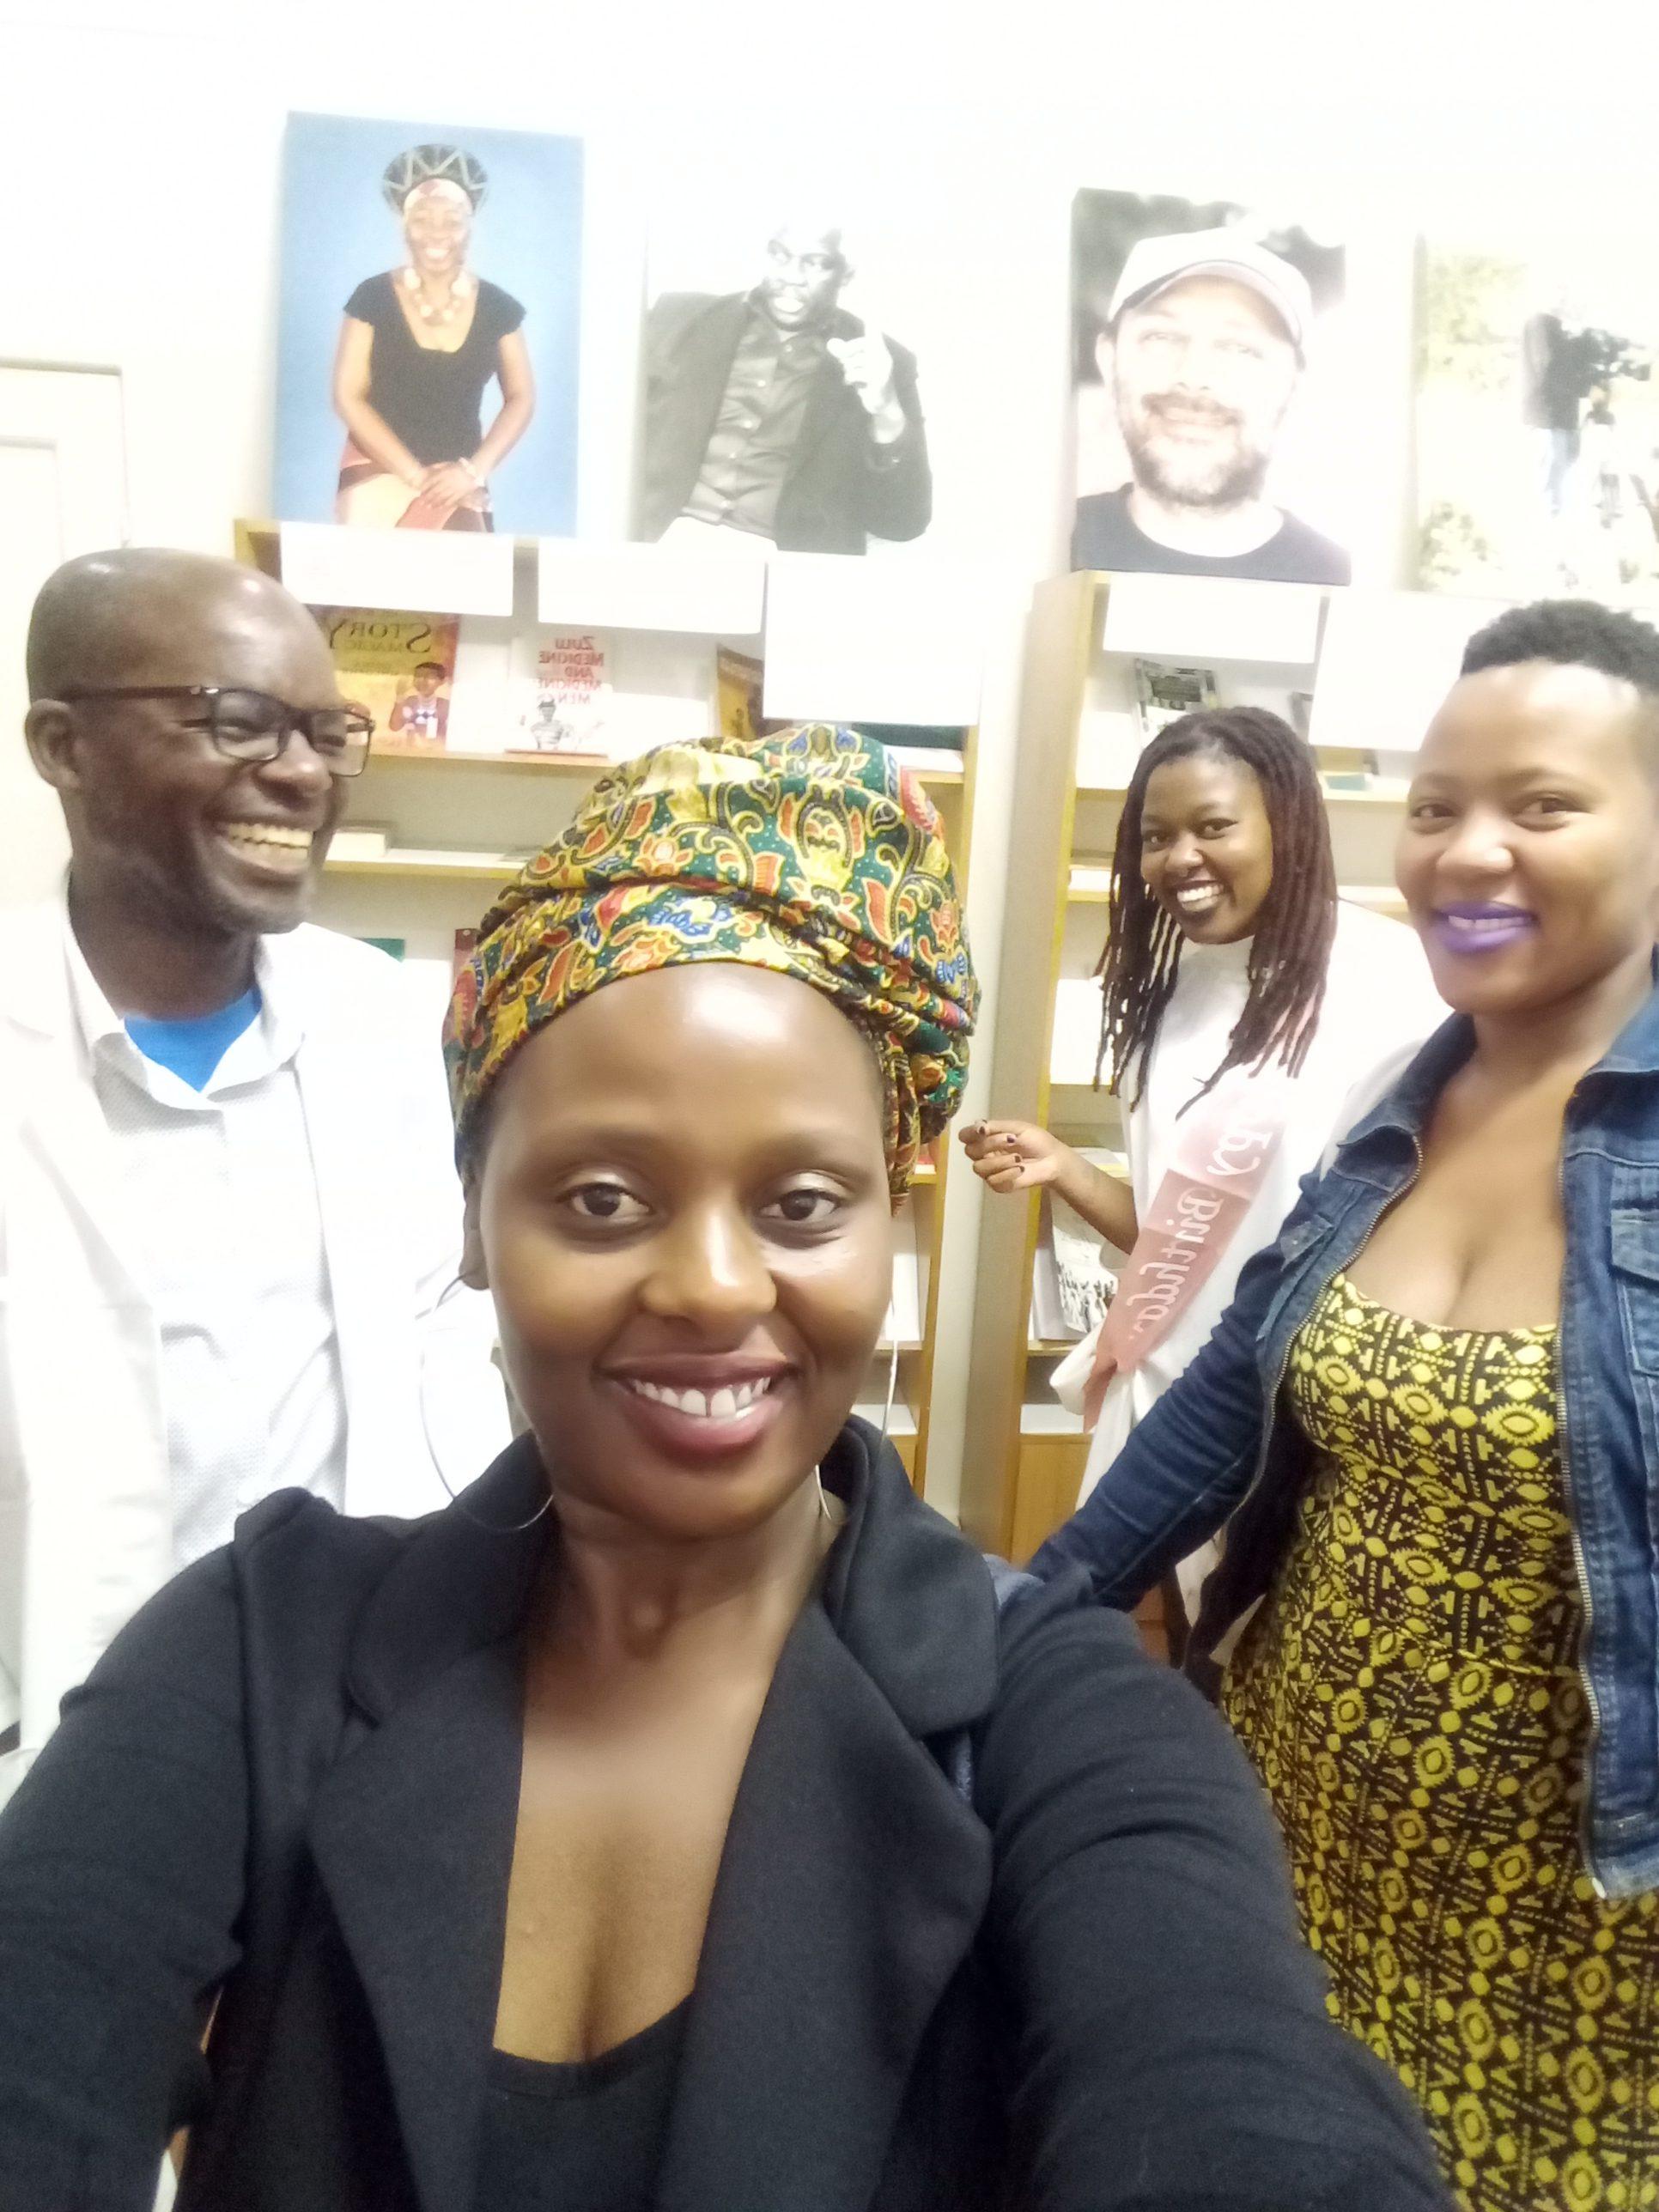 In front is Linda Masango, far back is Saneliwise Phungula and far right is Khetho Masango